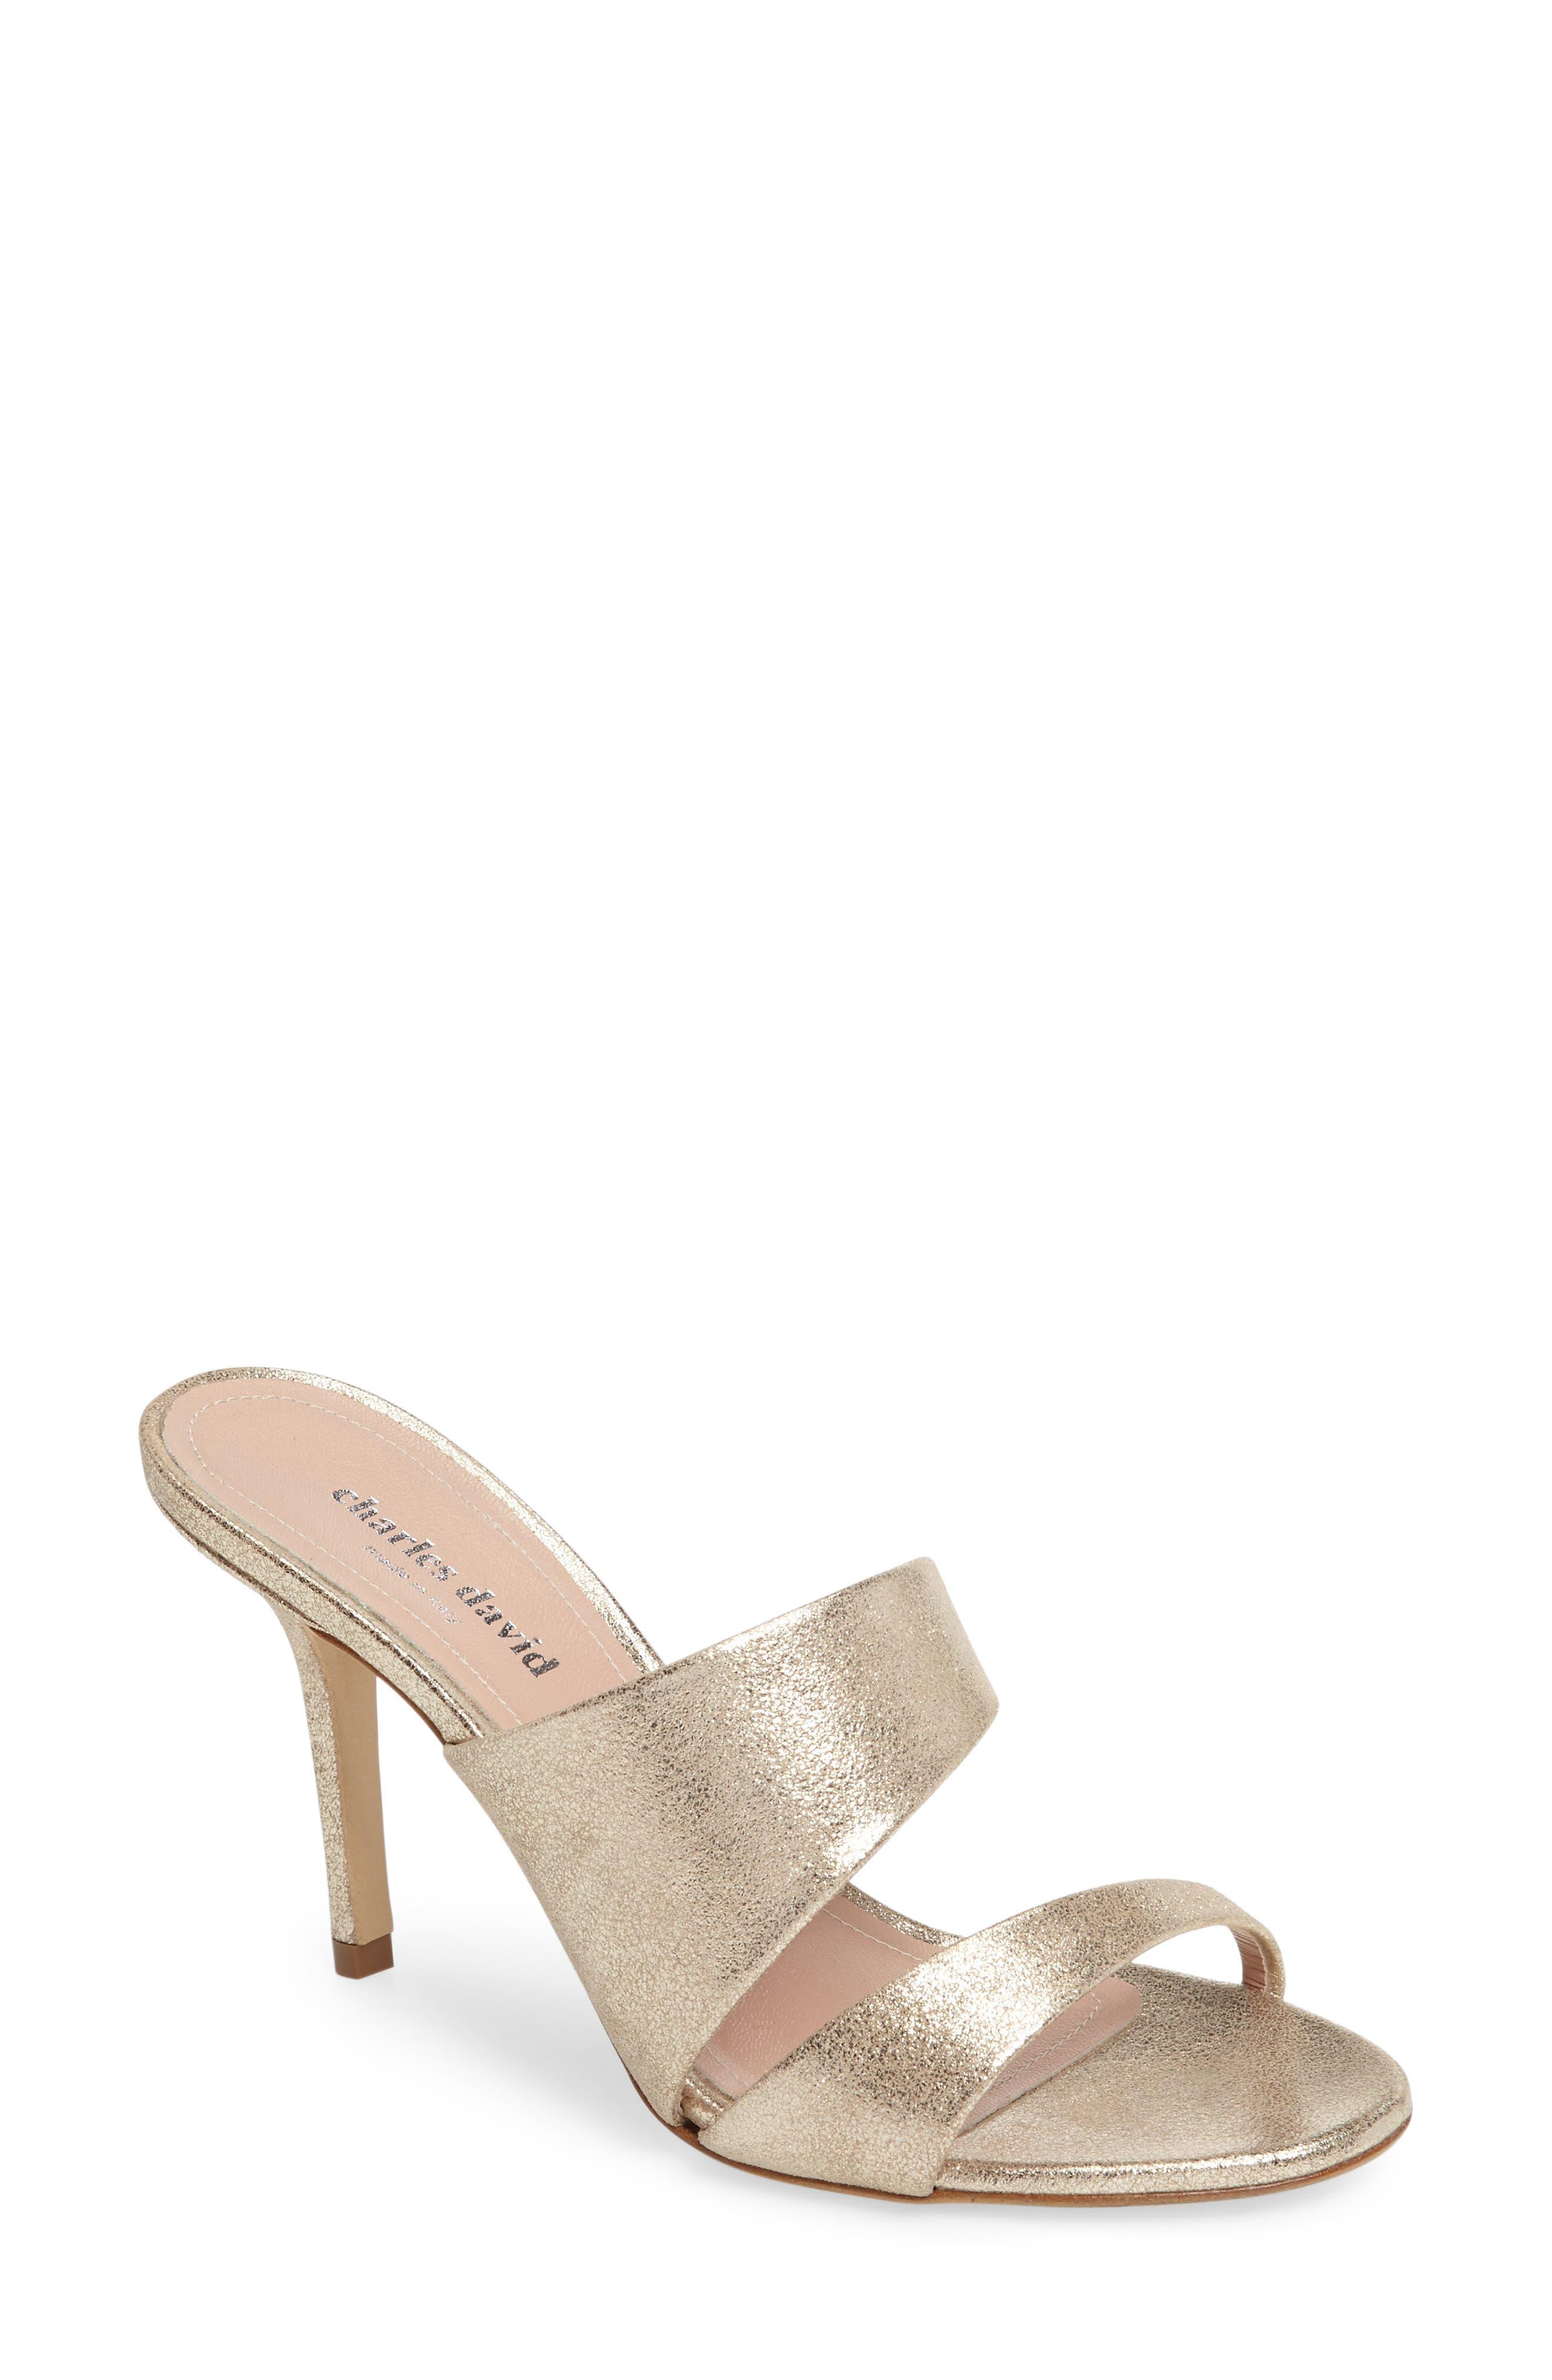 Status Sandal,                             Main thumbnail 1, color,                             Champagne Leather